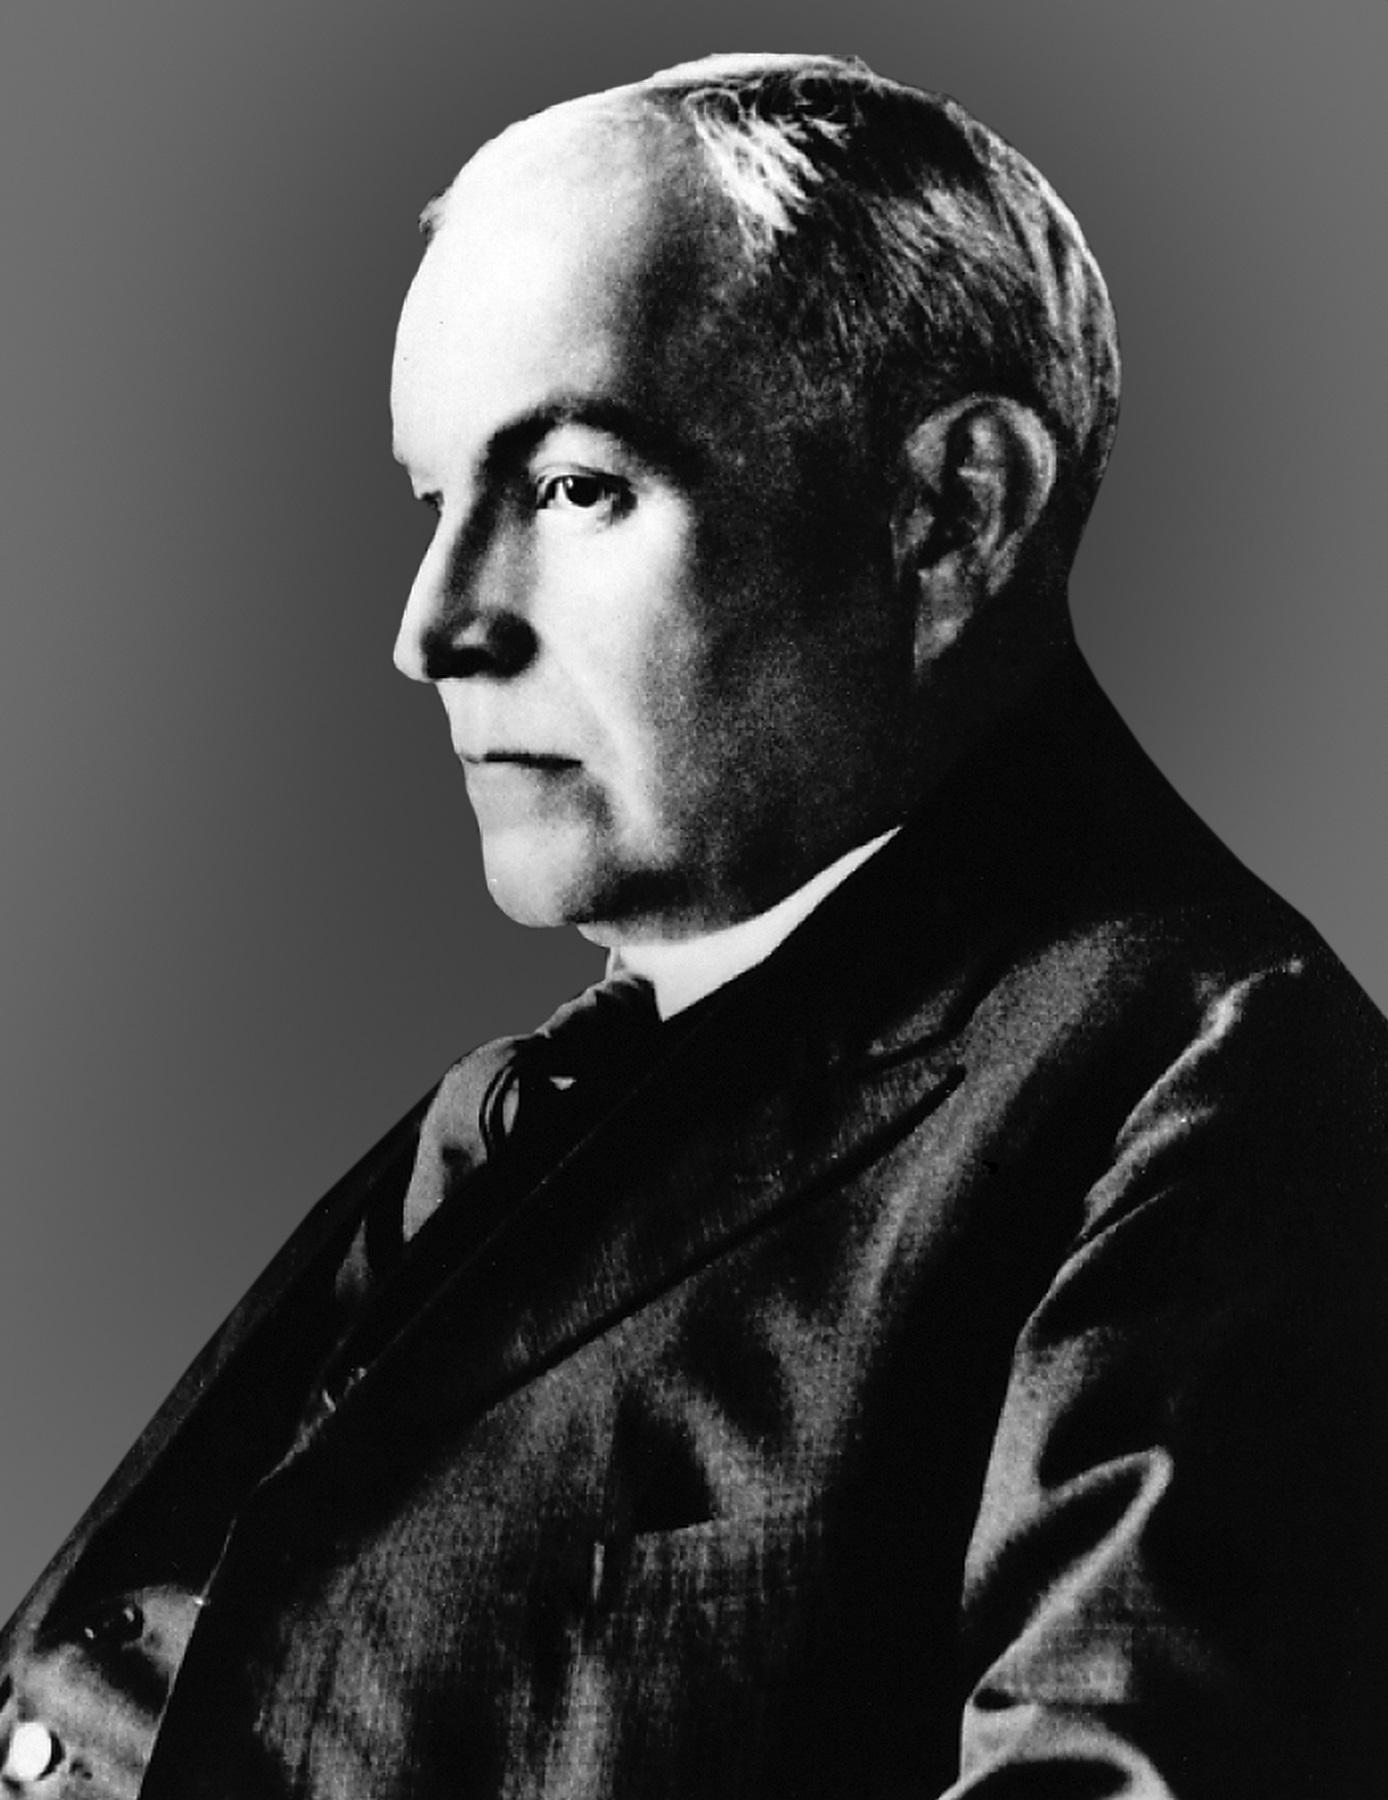 Thomas Franklin Wrenn